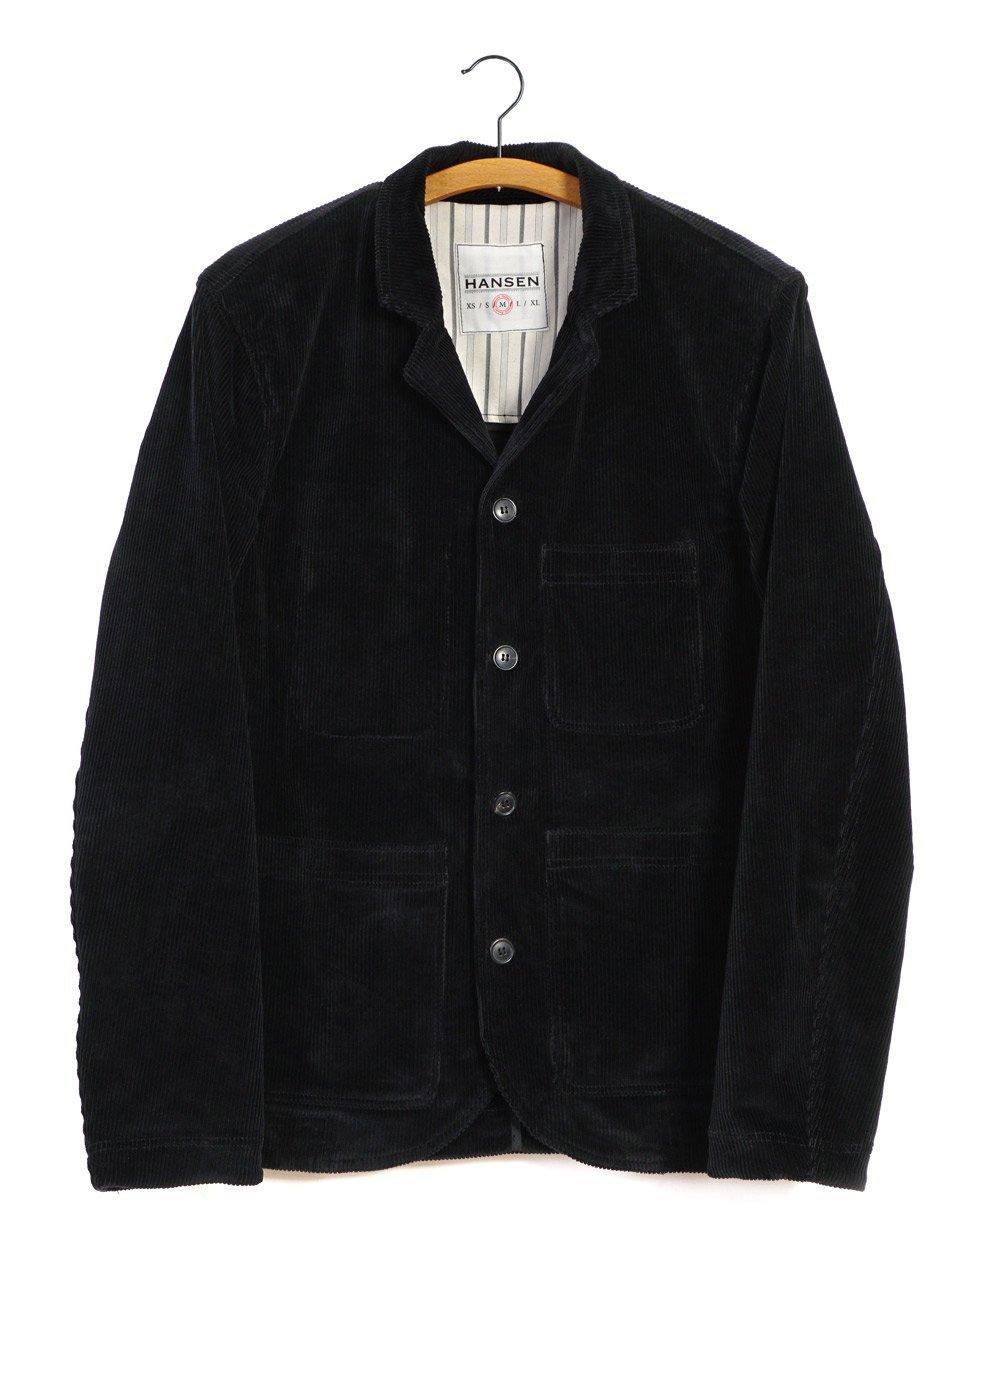 Hansen Garments NICOLAI | Informal Four Button Blazer | Black